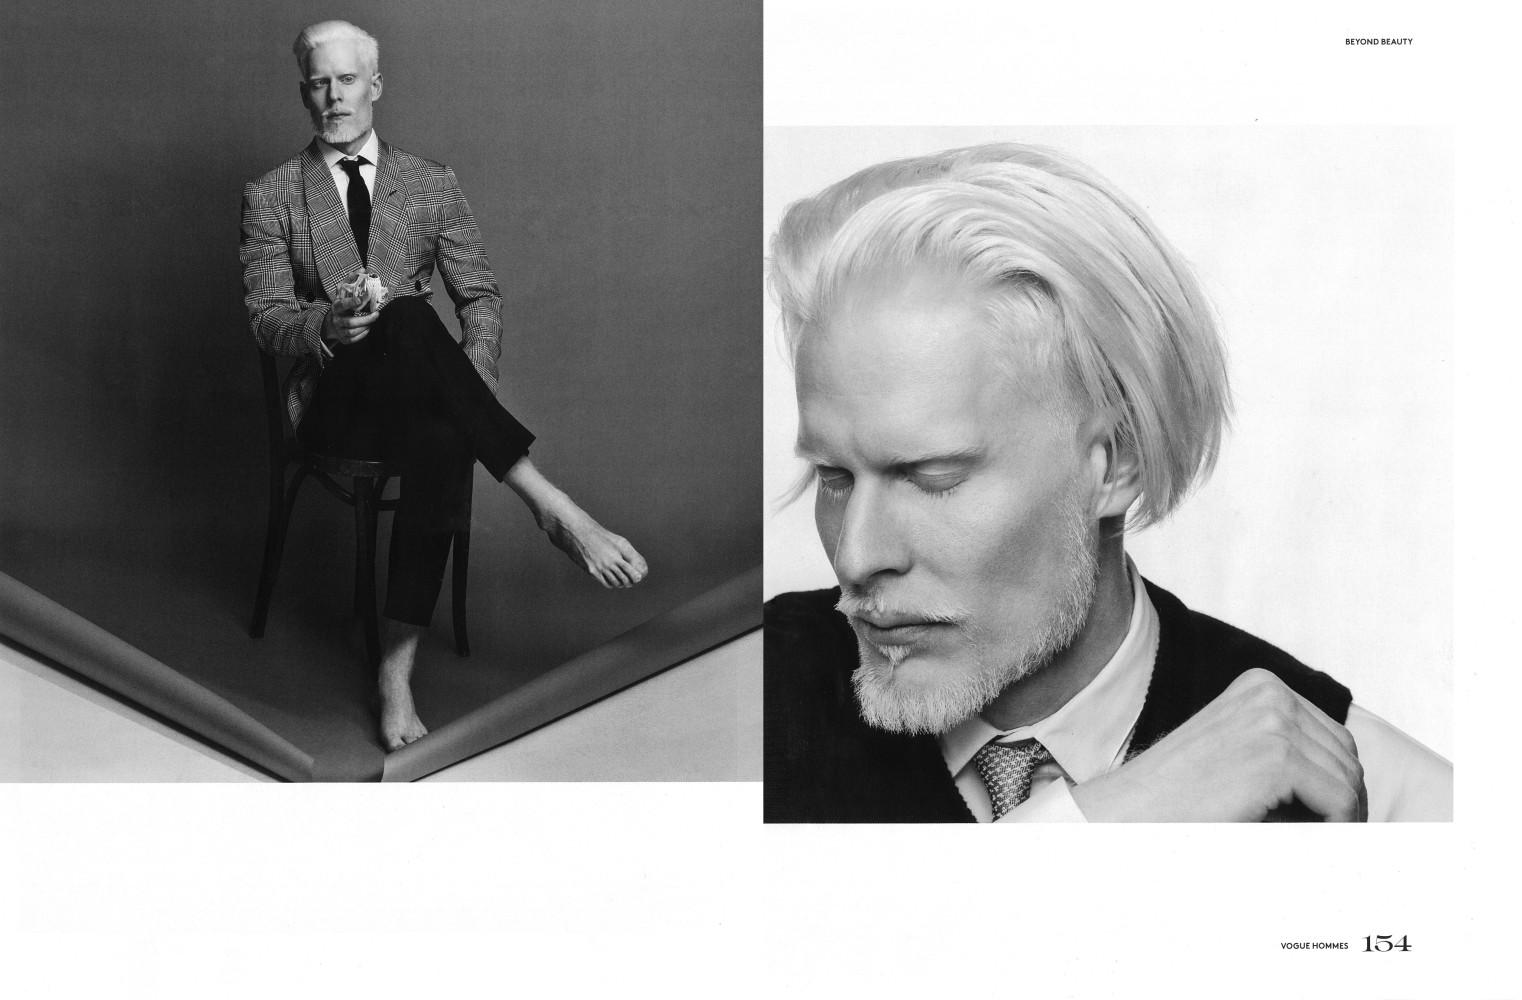 Stephen Thompson & Luc Bruyere for Vogue Hommes